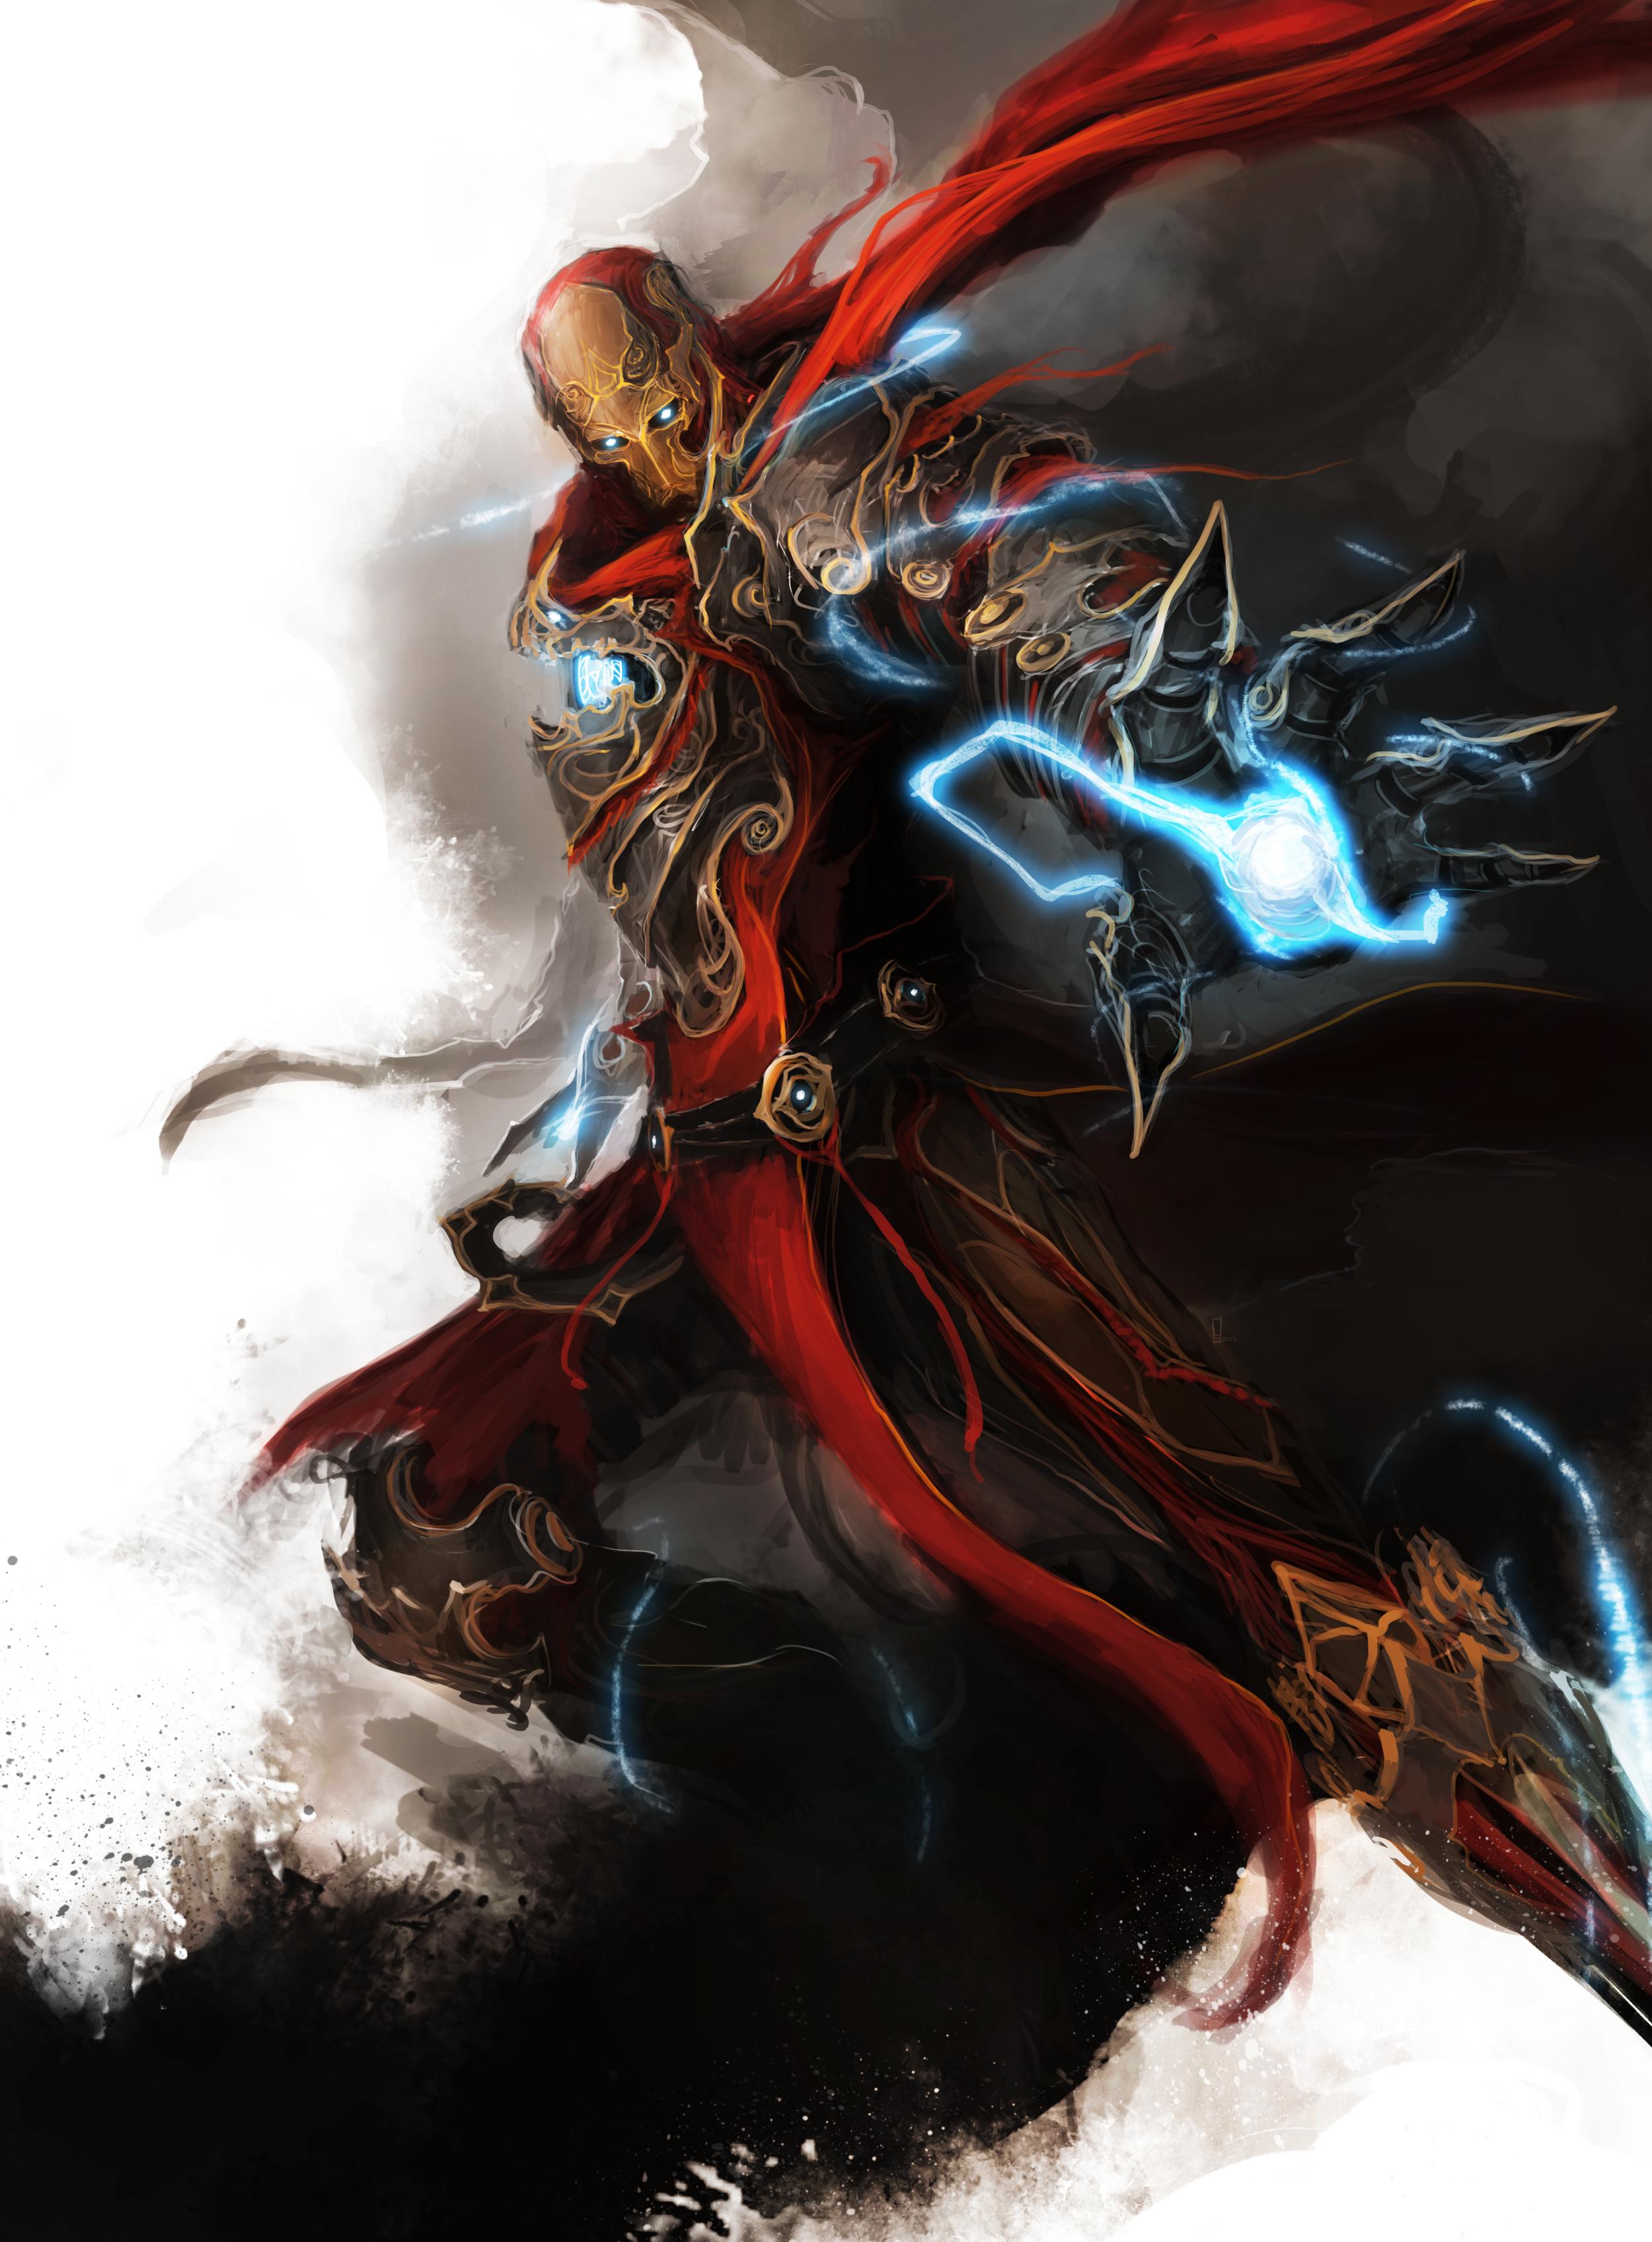 the_avengers___iron_man_by_thedurrrrian-d55tn2d.jpg